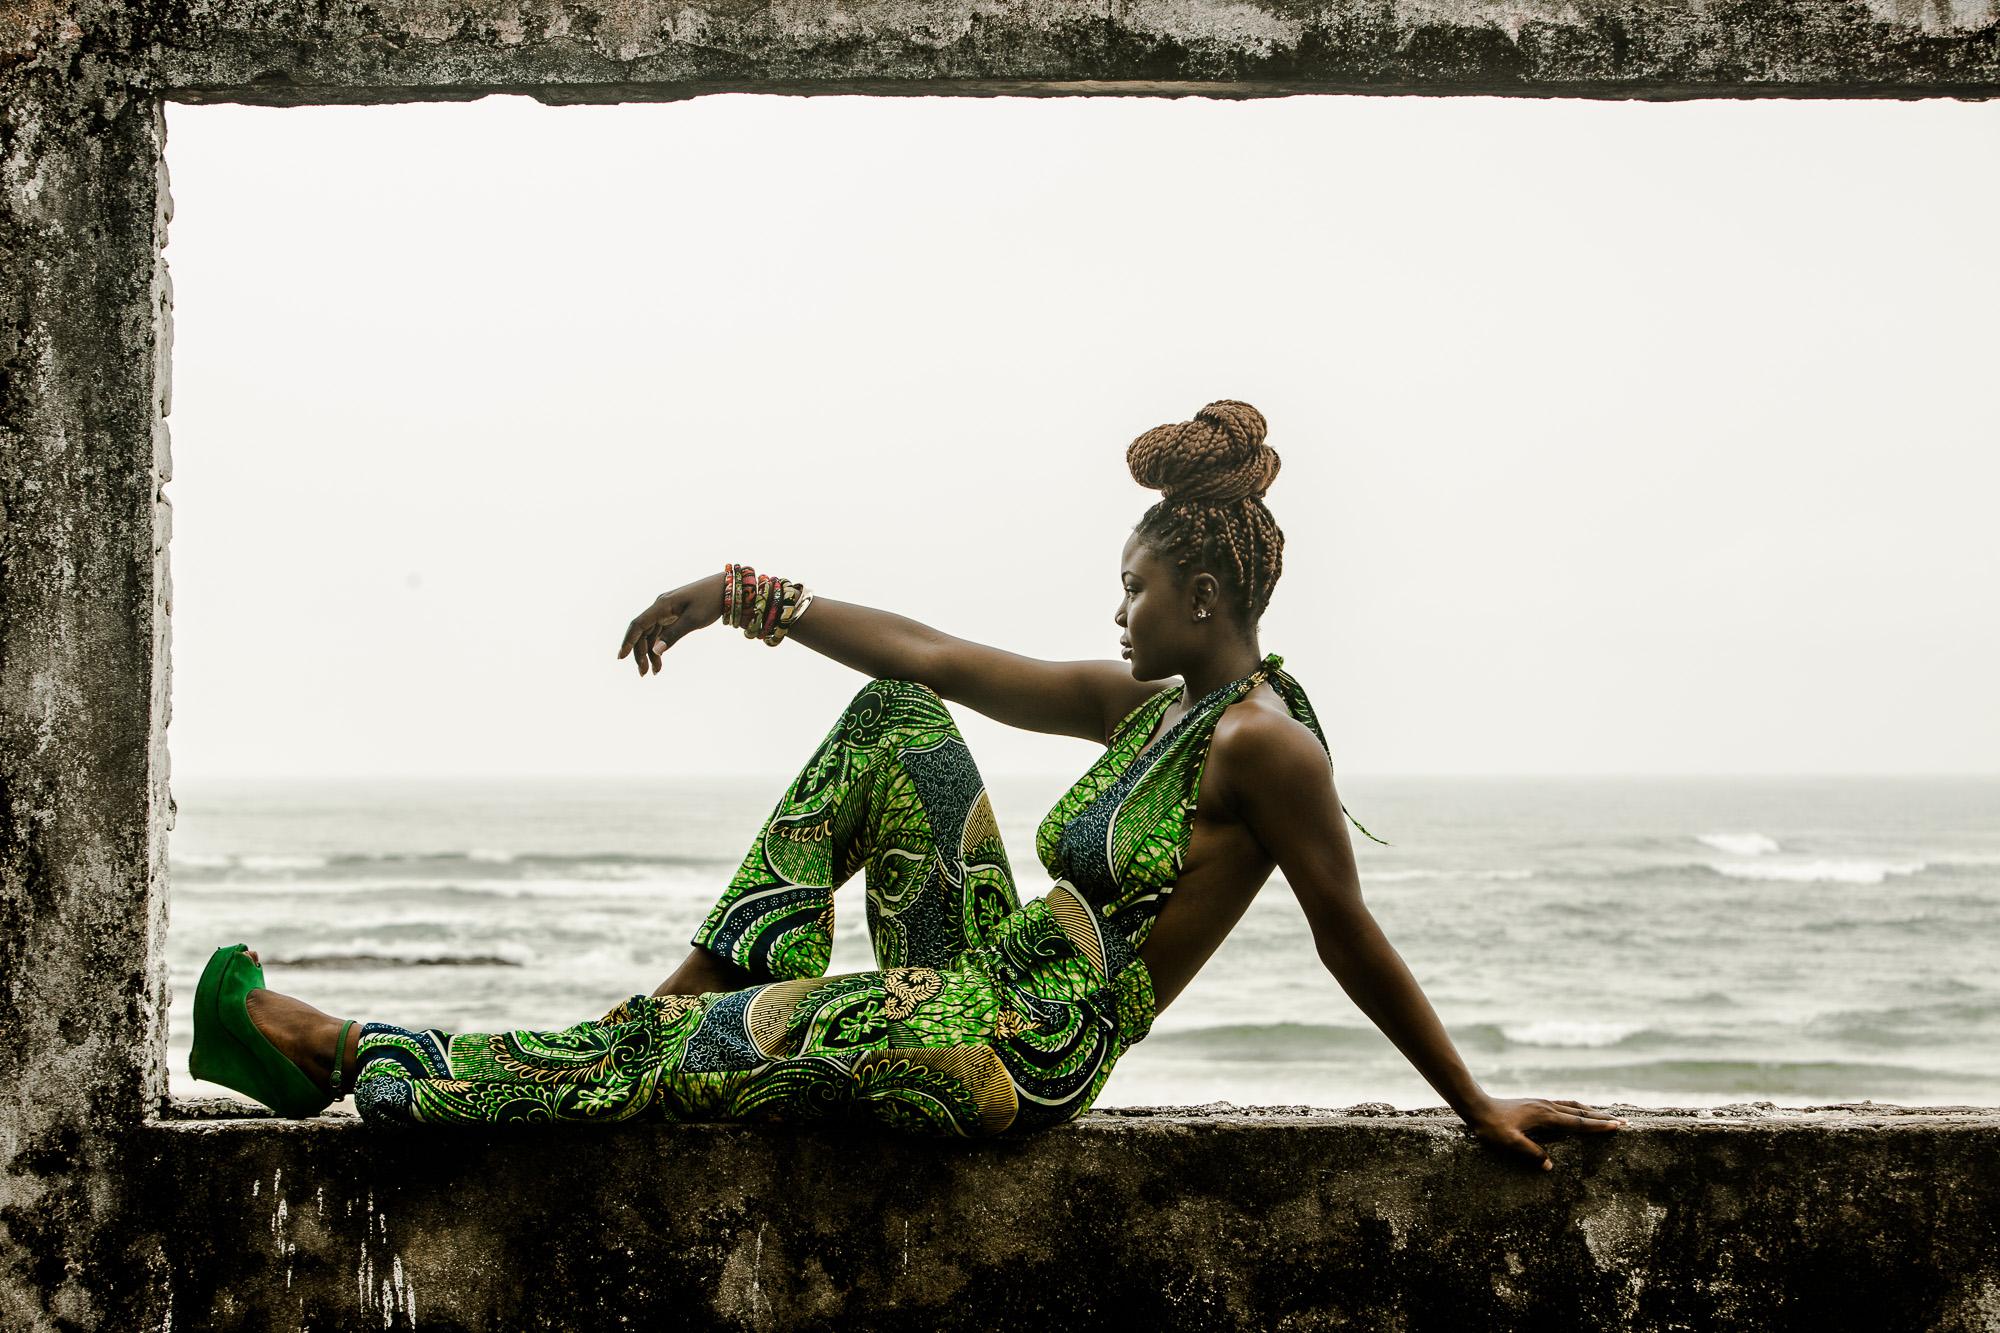 140112-Liberia-Wingard-0033-web.jpg